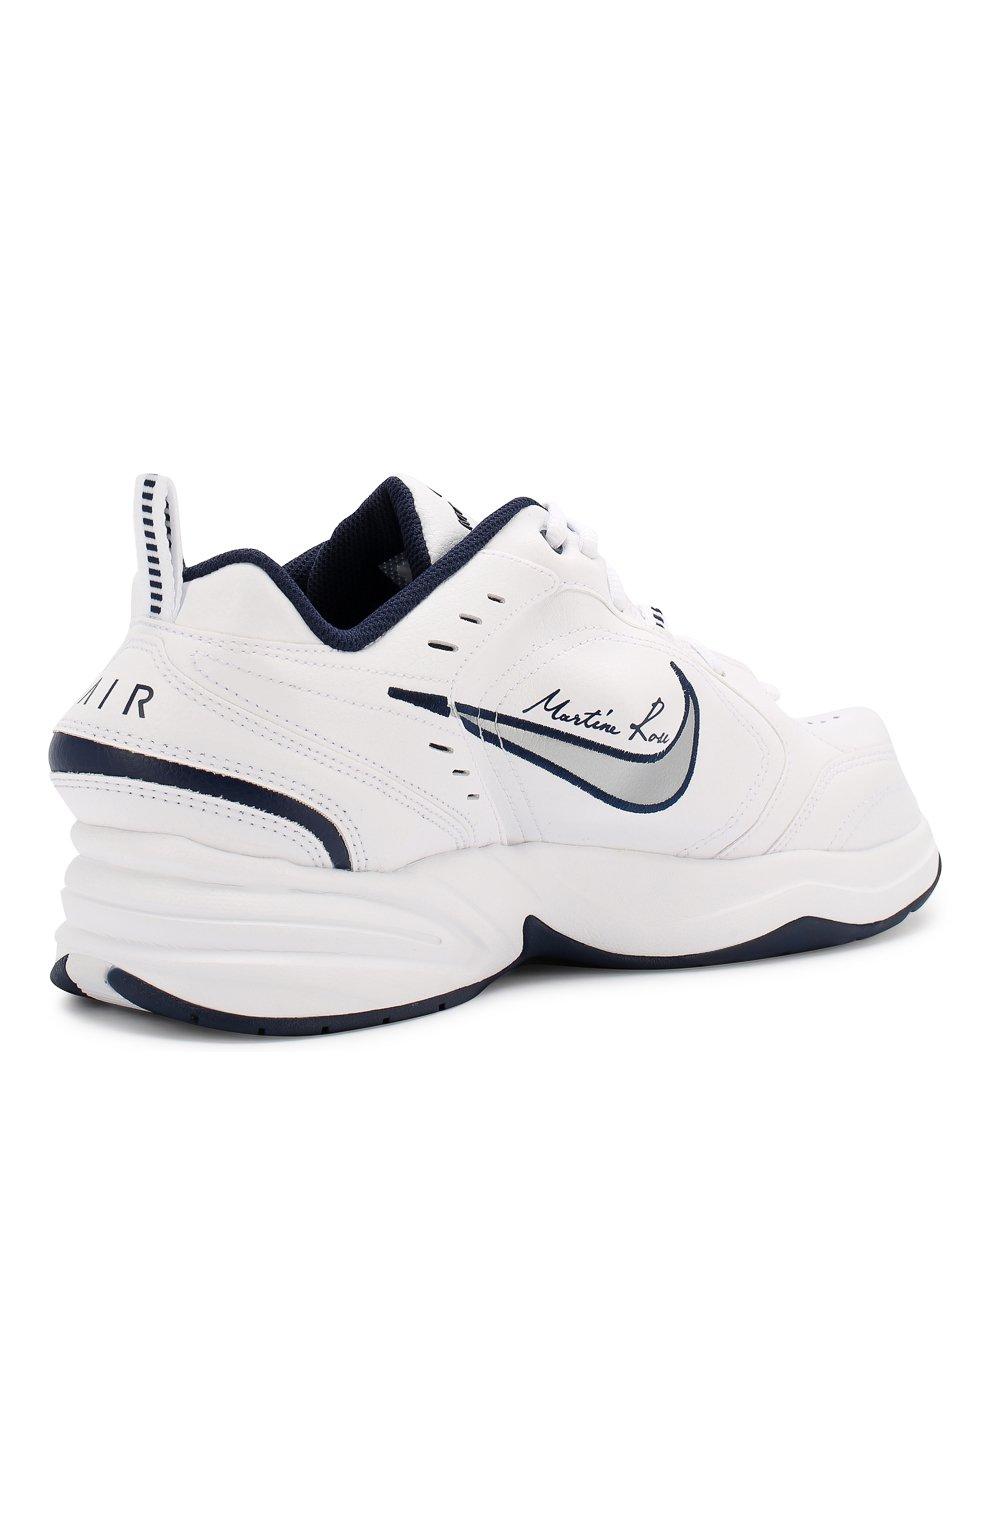 aec240798 Кожаные кроссовки NikeLab x Martine Rose Air Monarch IV NikeLab белые |  Фото №4